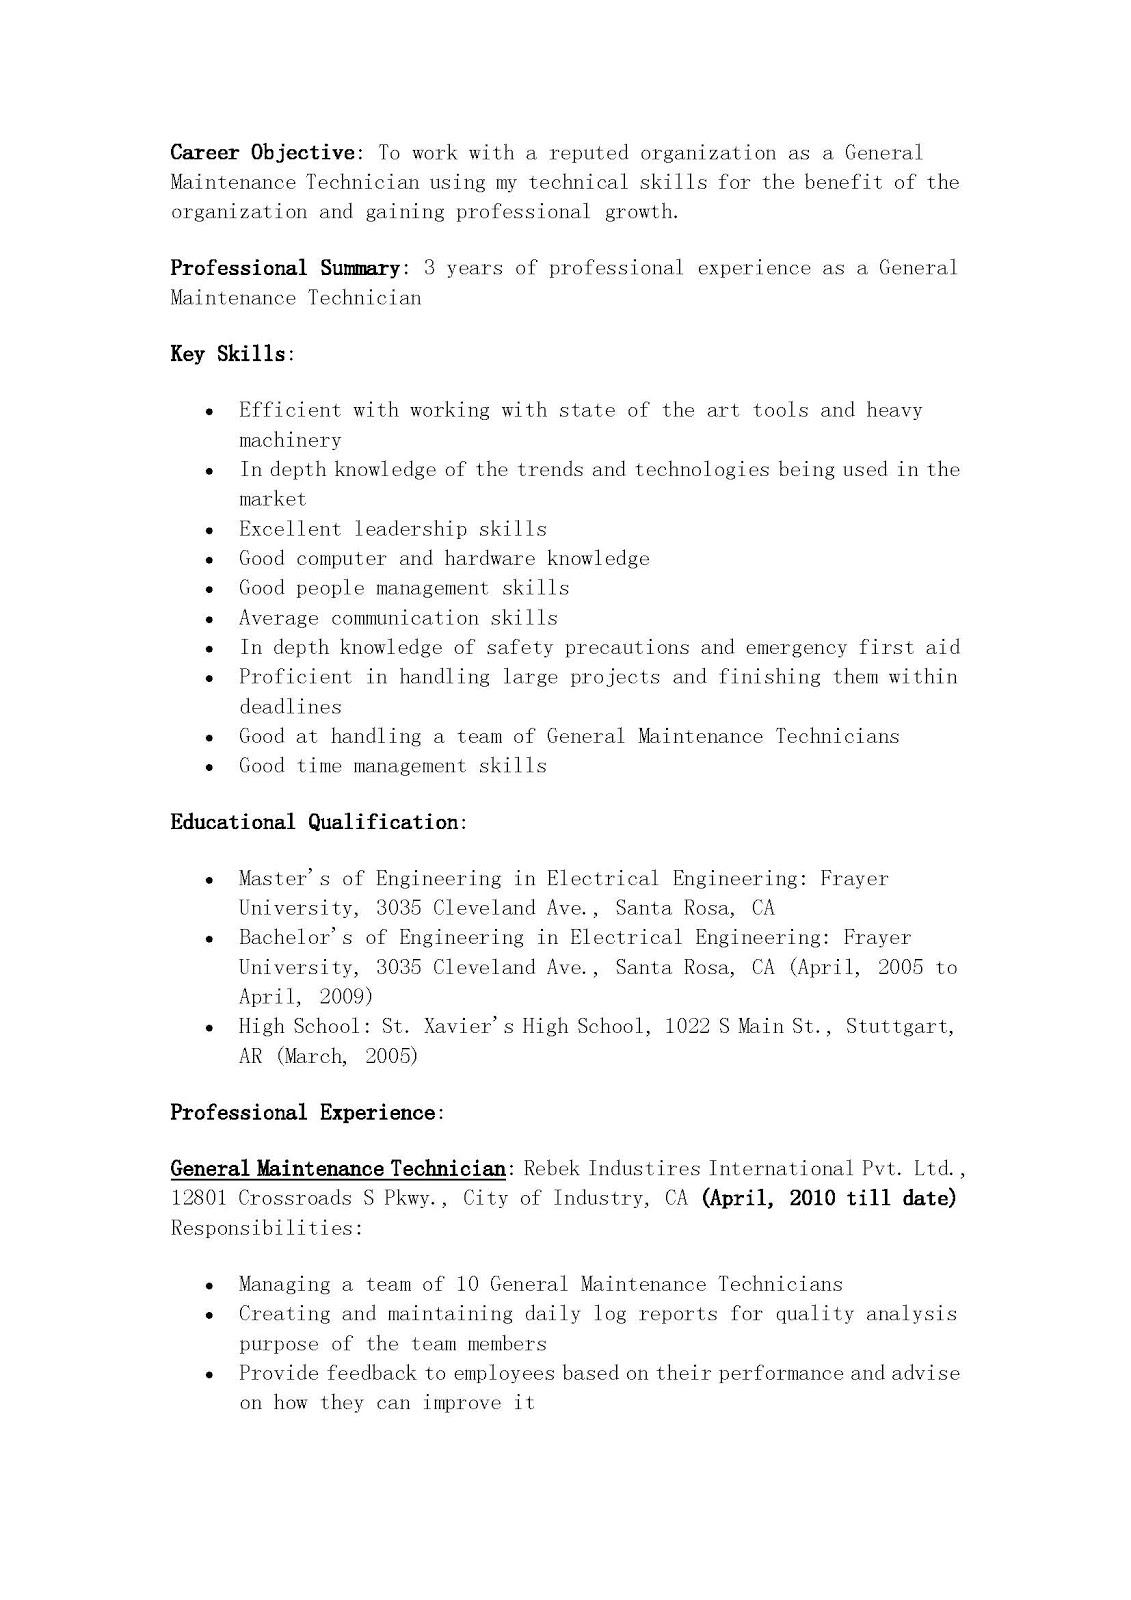 Resume Maintenance Or Mechanical Engineer